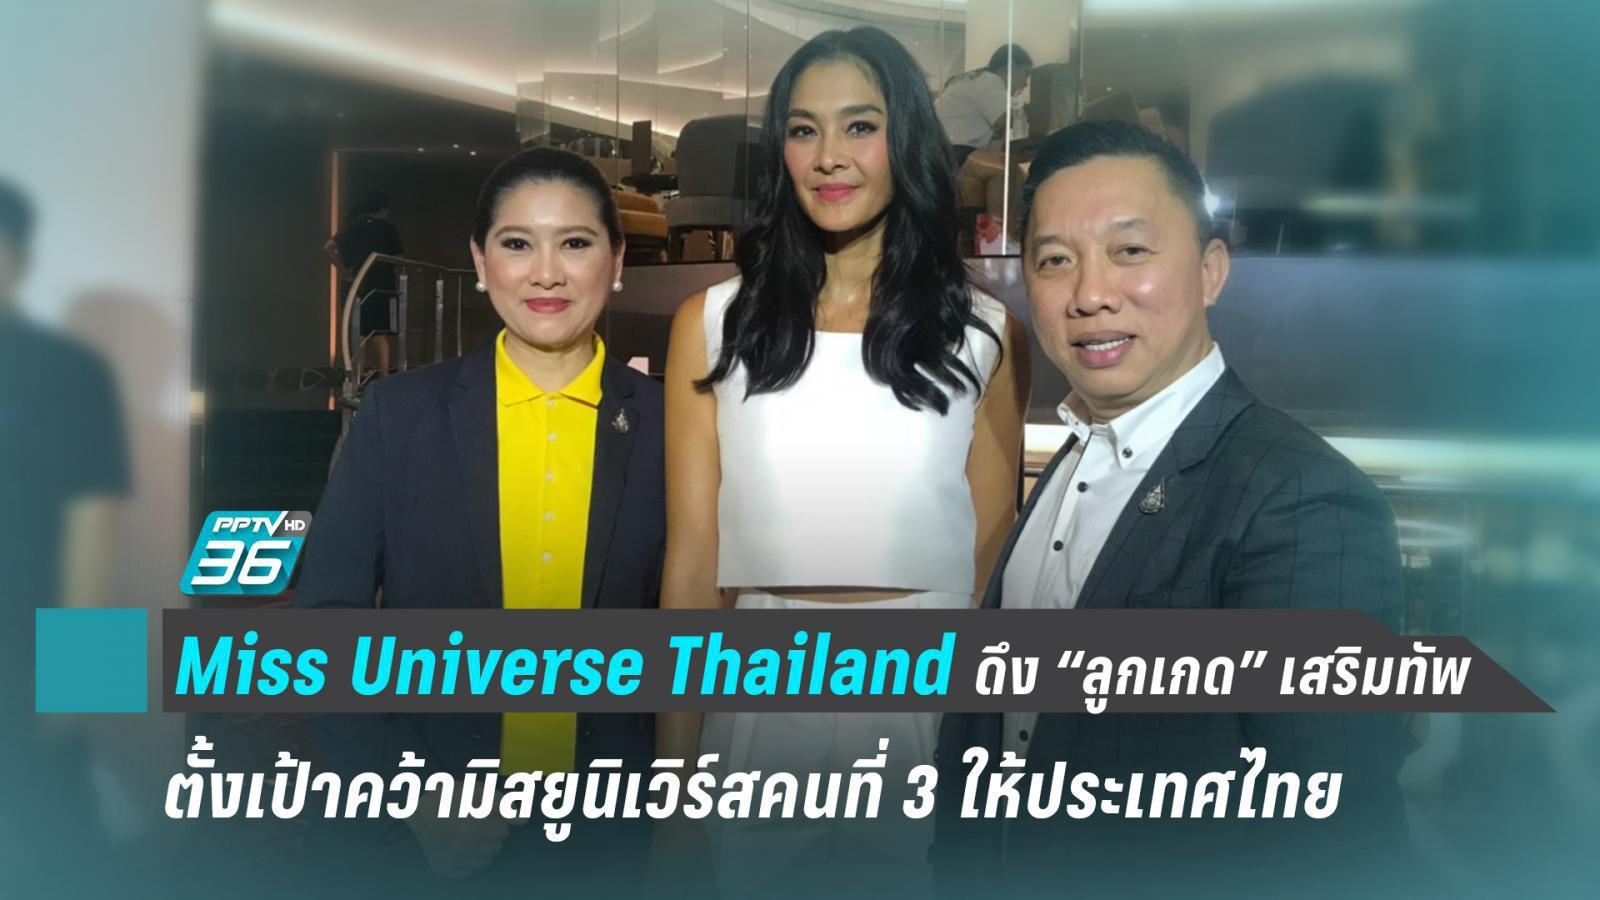 Miss Universe Thailand pulls